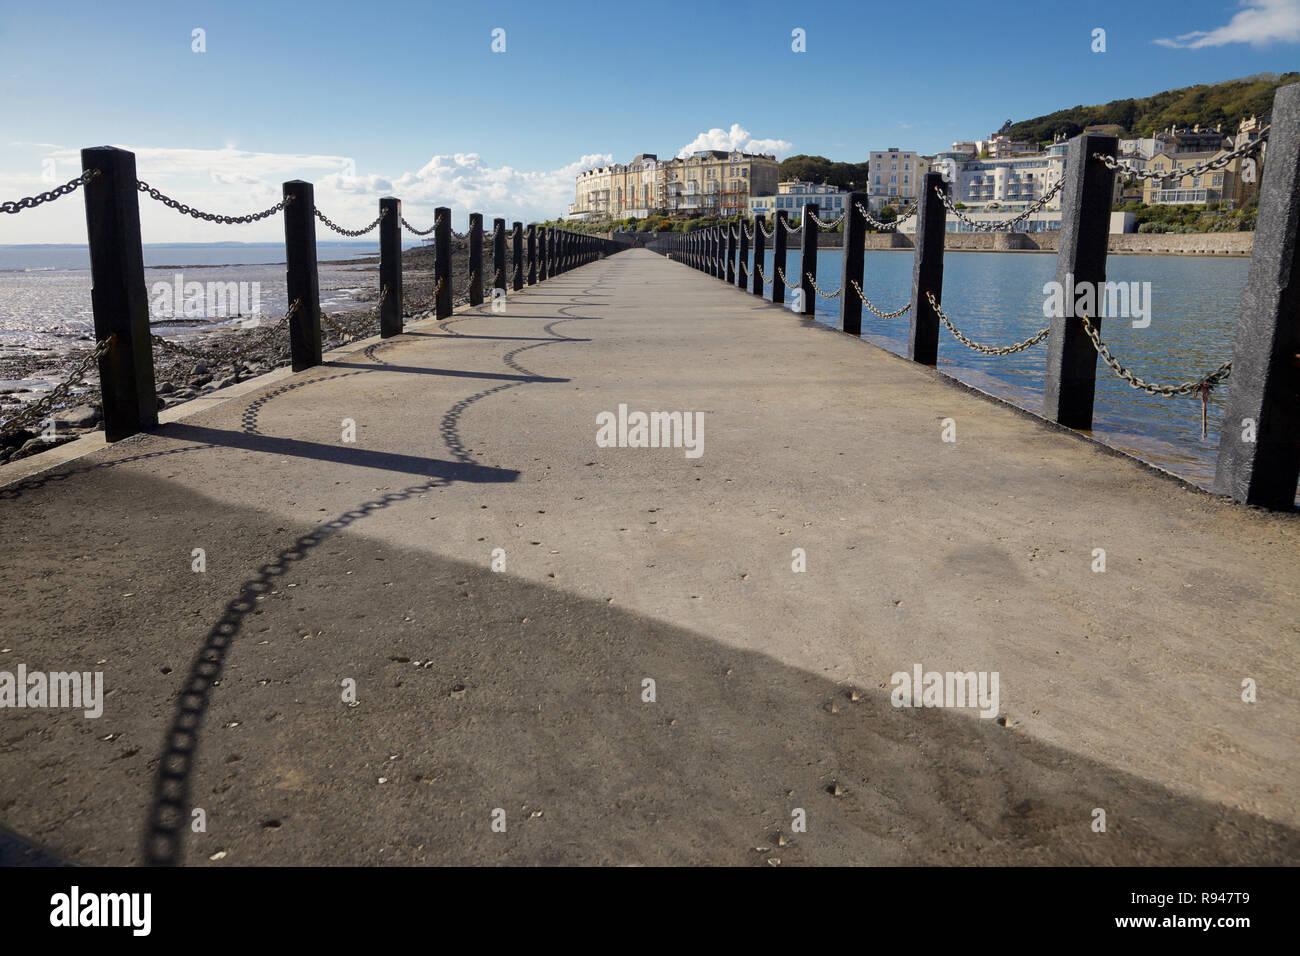 Walk way at  Marine Lake, Weston Super Mare, England - Stock Image